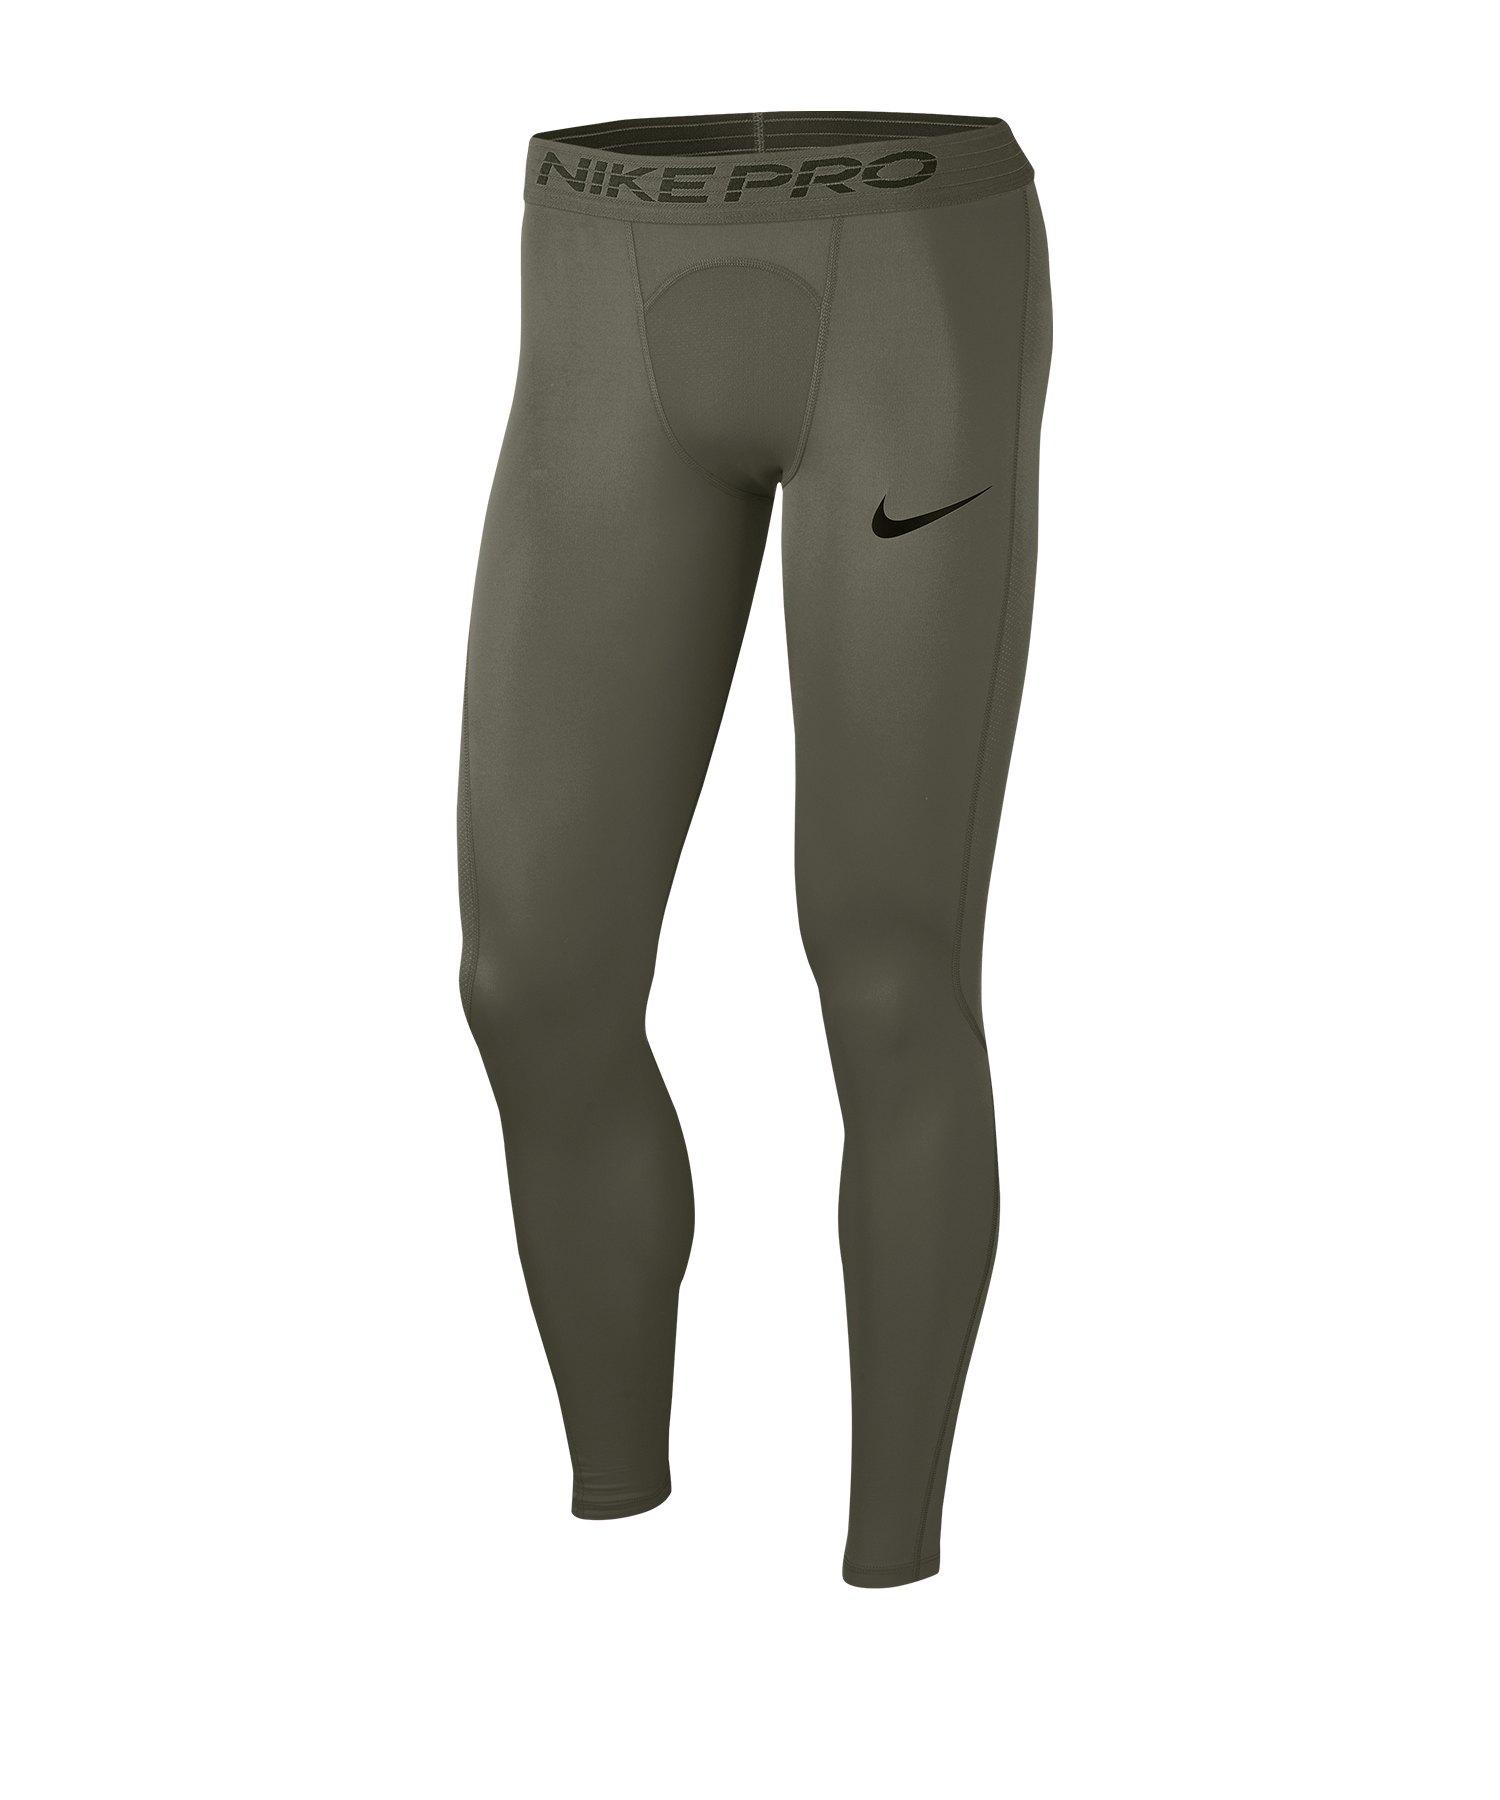 Nike Pro Tights Hose lang Grün F325 - gruen